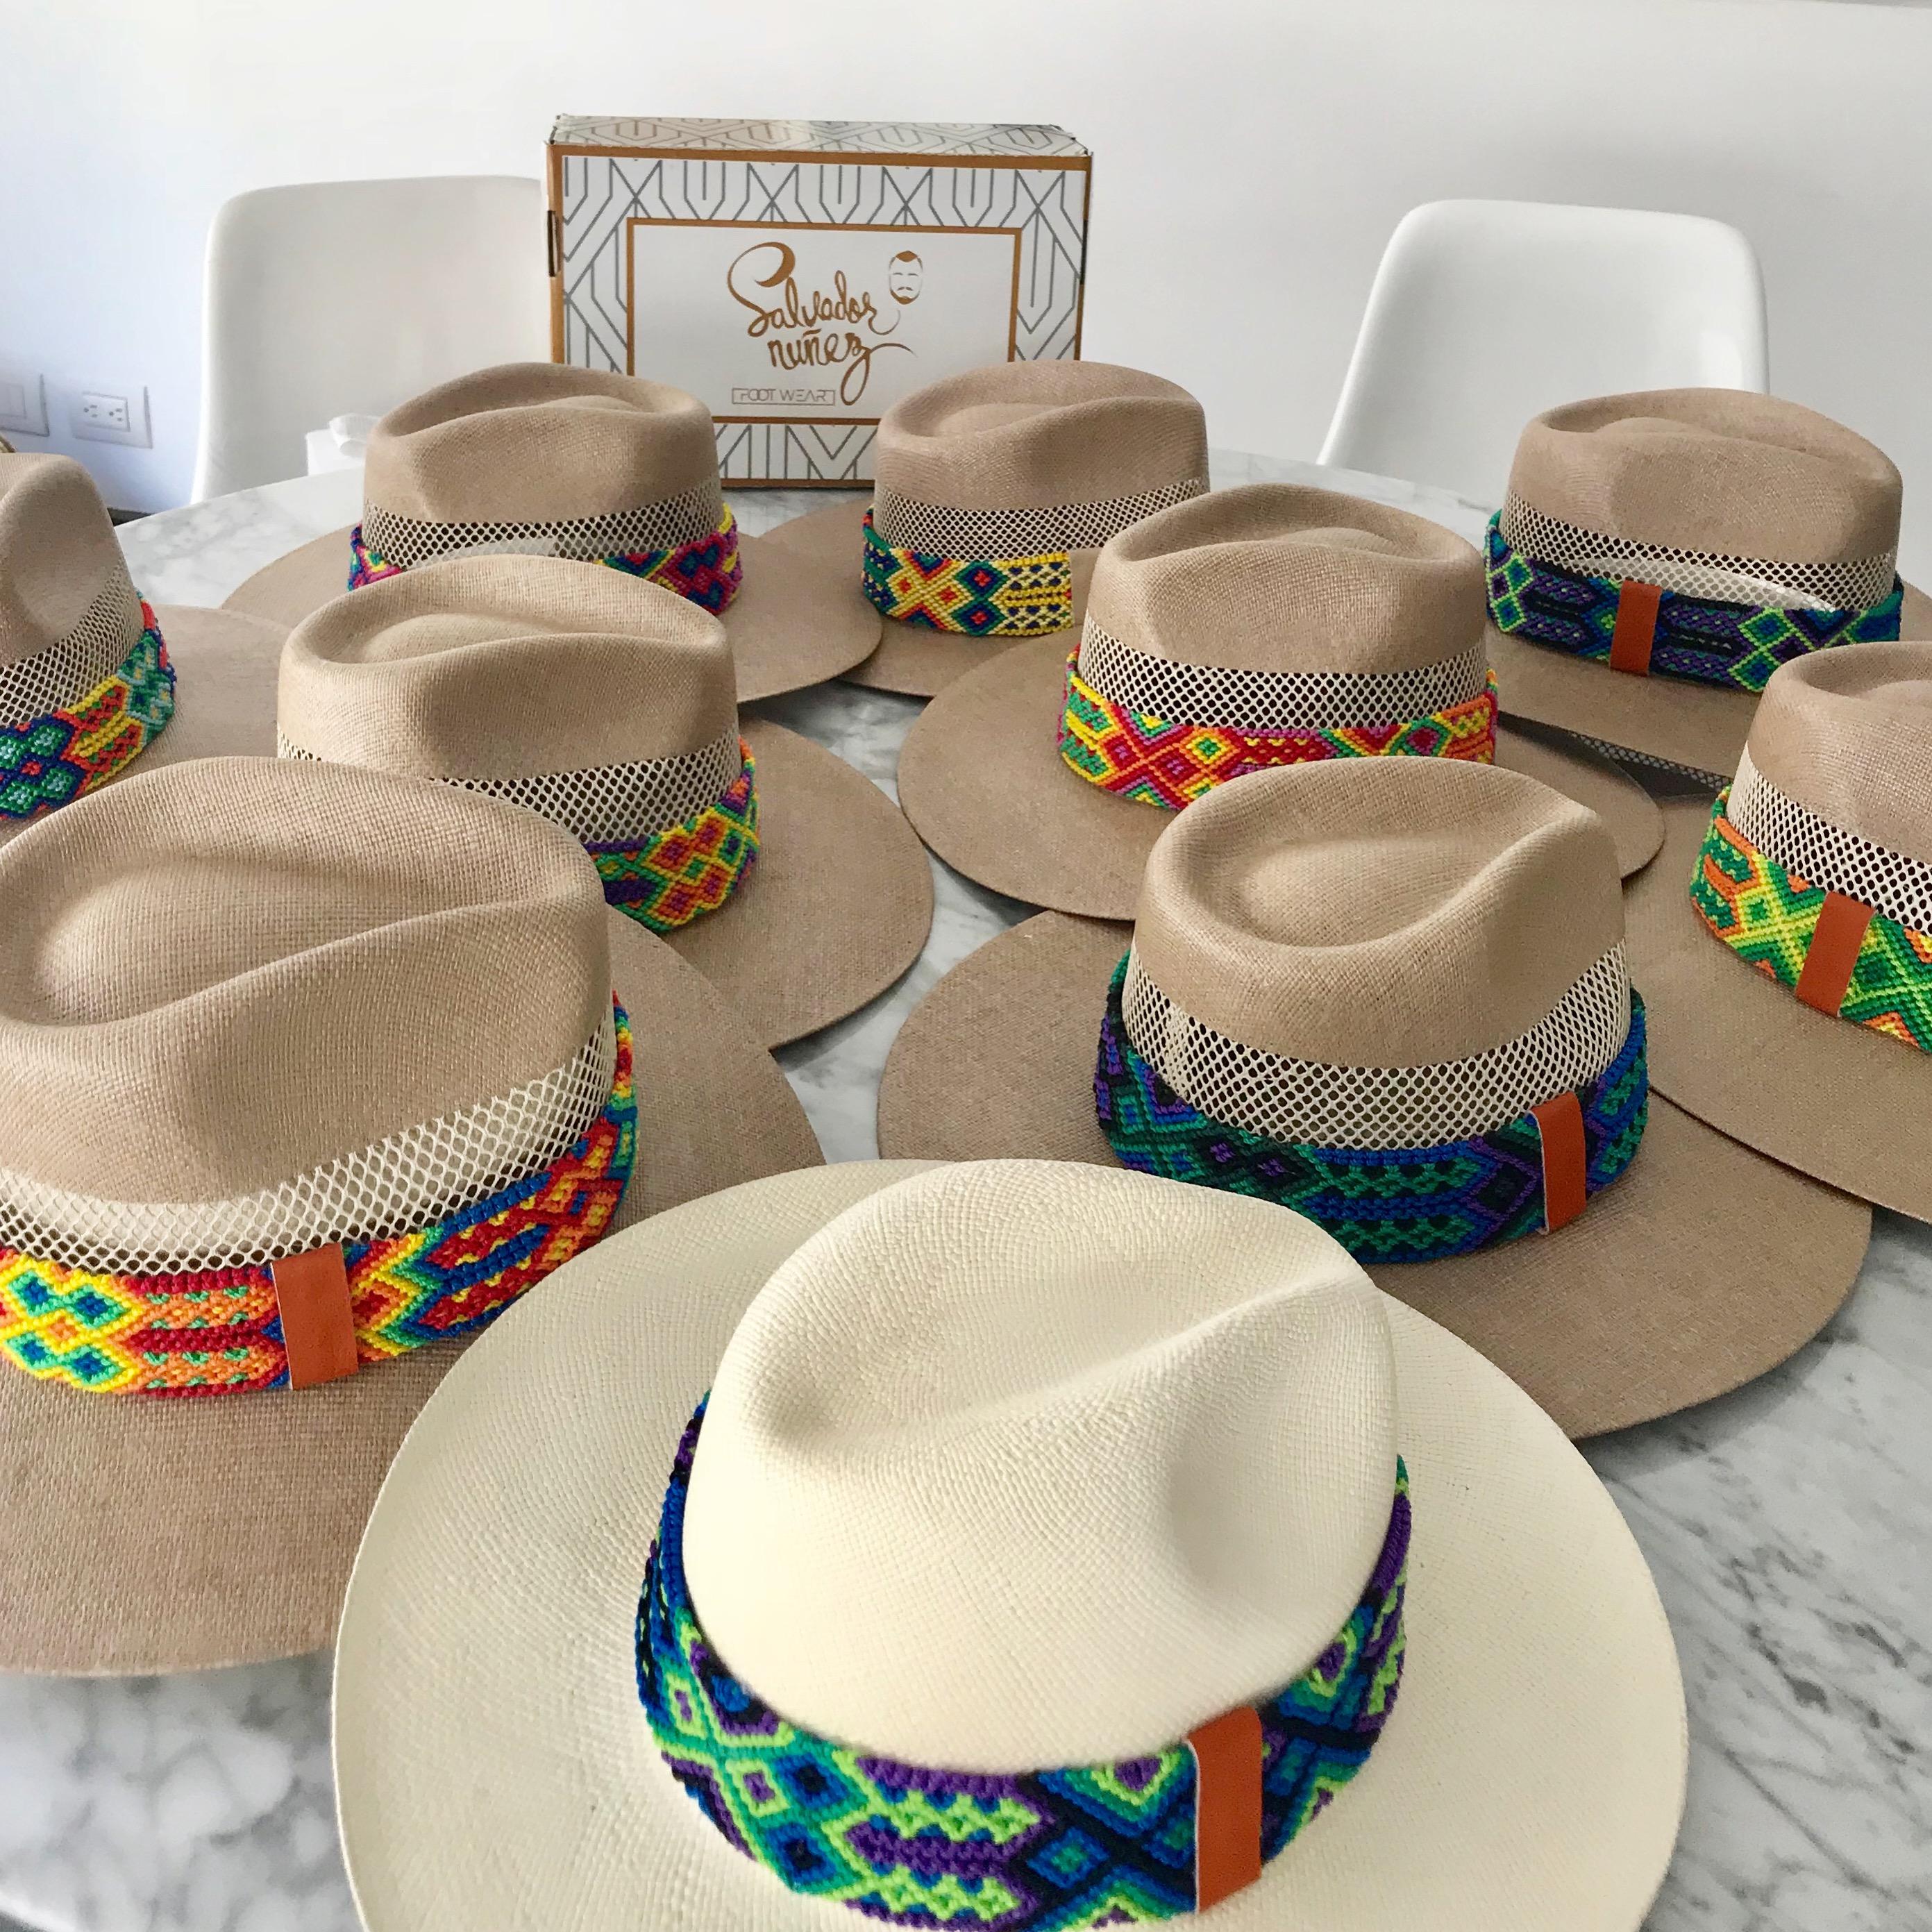 sombreros salvador nunez shop